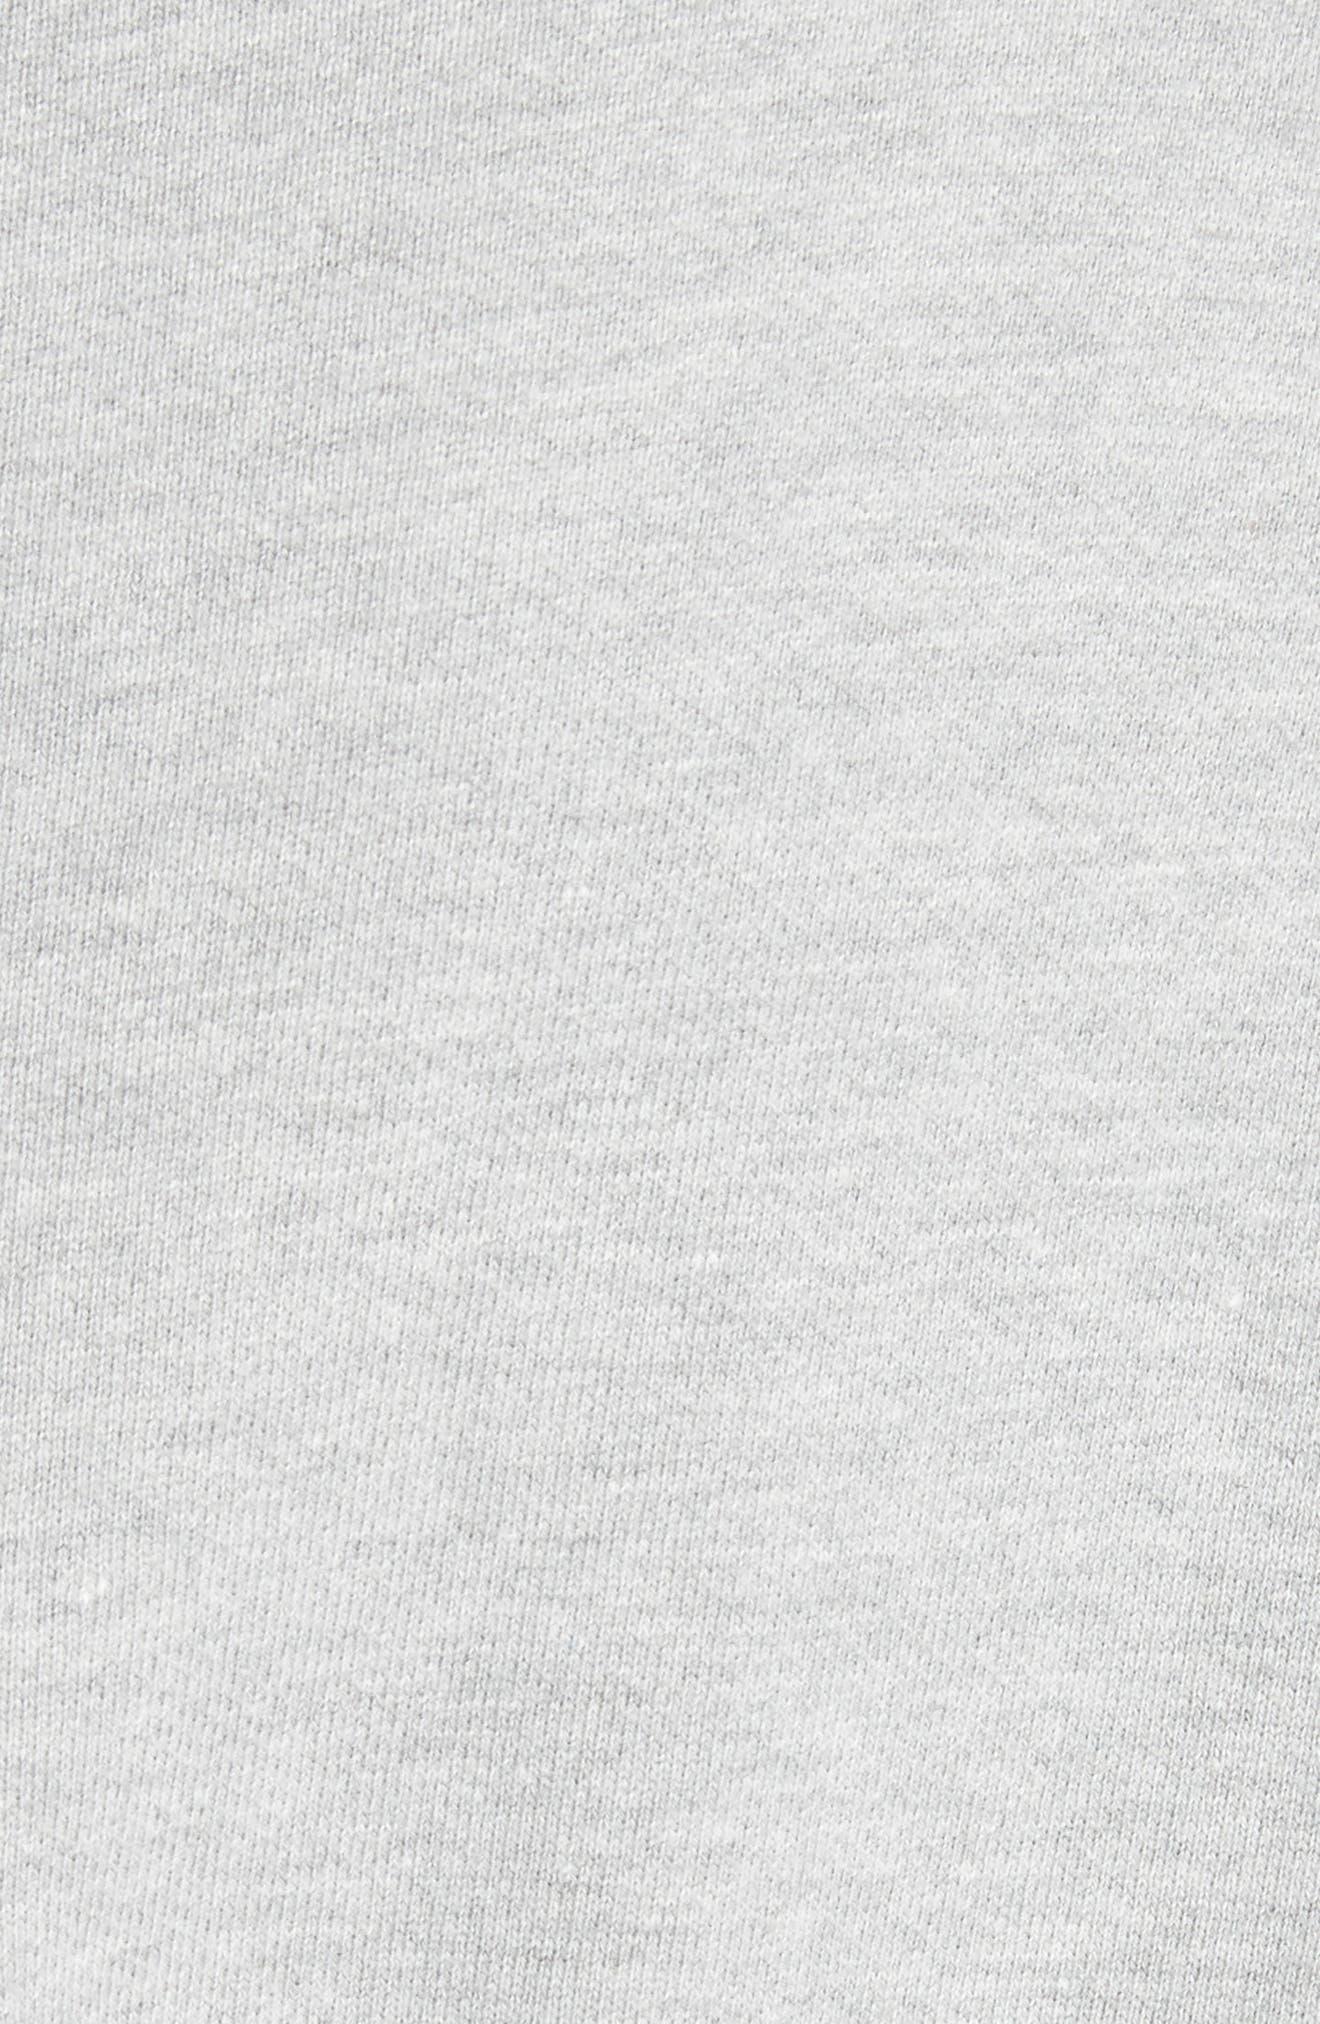 Asymmetrical Ruffle Sweatshirt,                             Alternate thumbnail 5, color,                             060